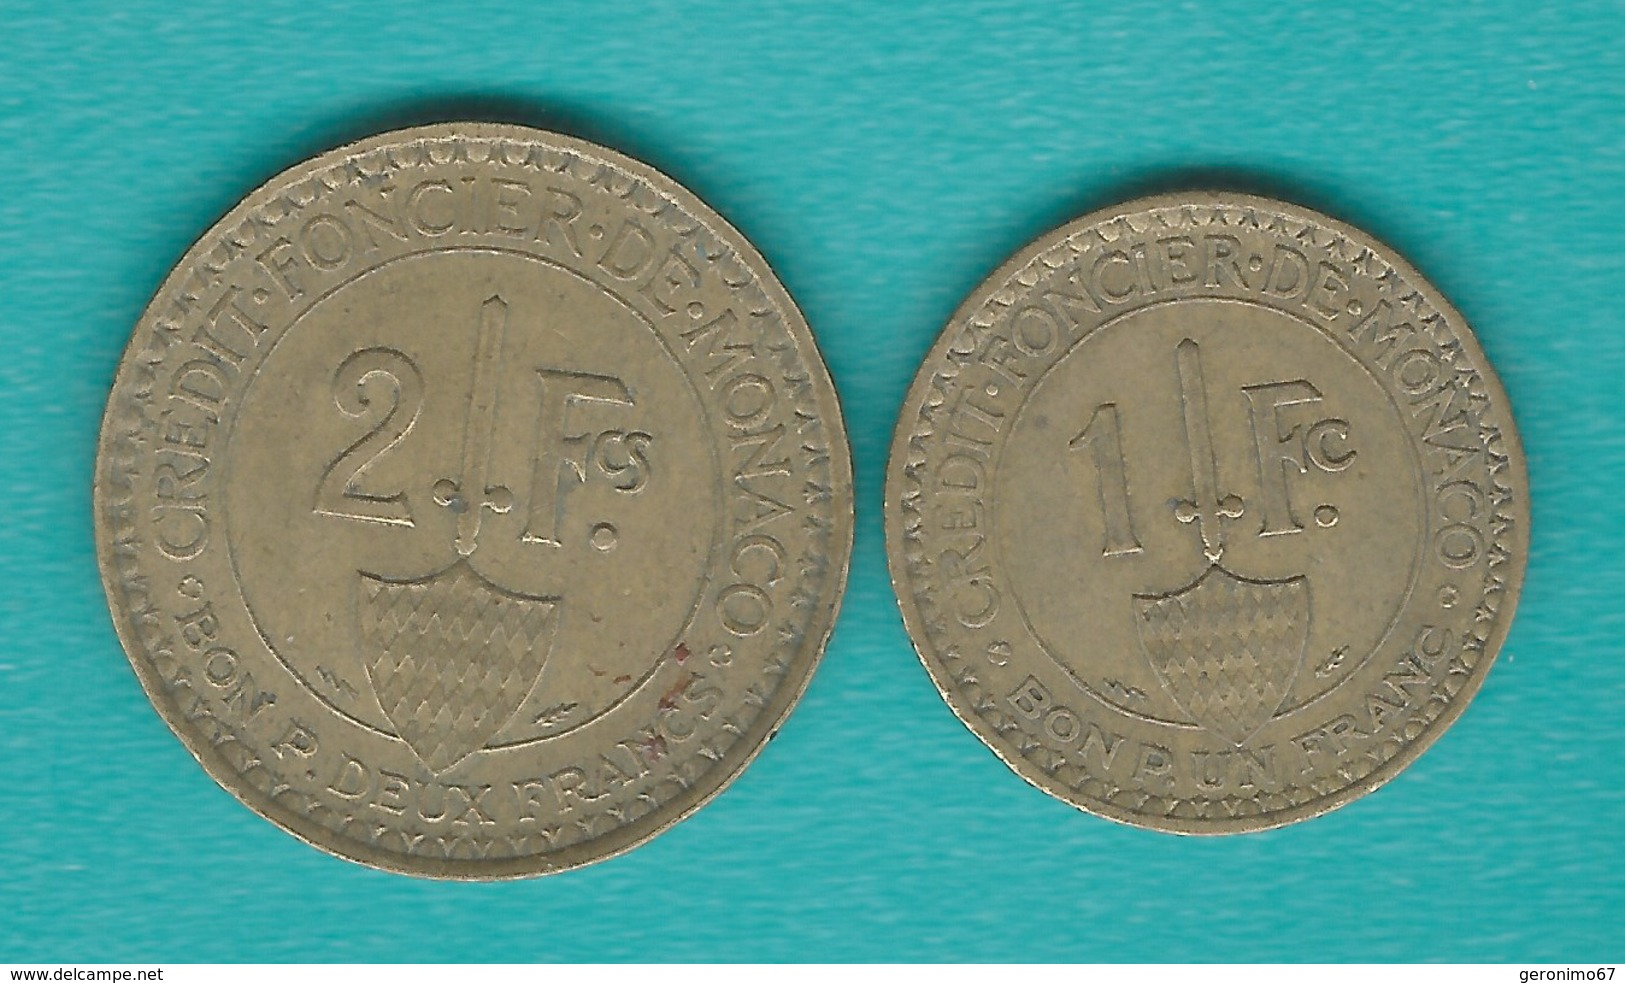 Monaco - Louis II - 1926 - 1 & 2 Francs - KM114 & KM115 - Monaco